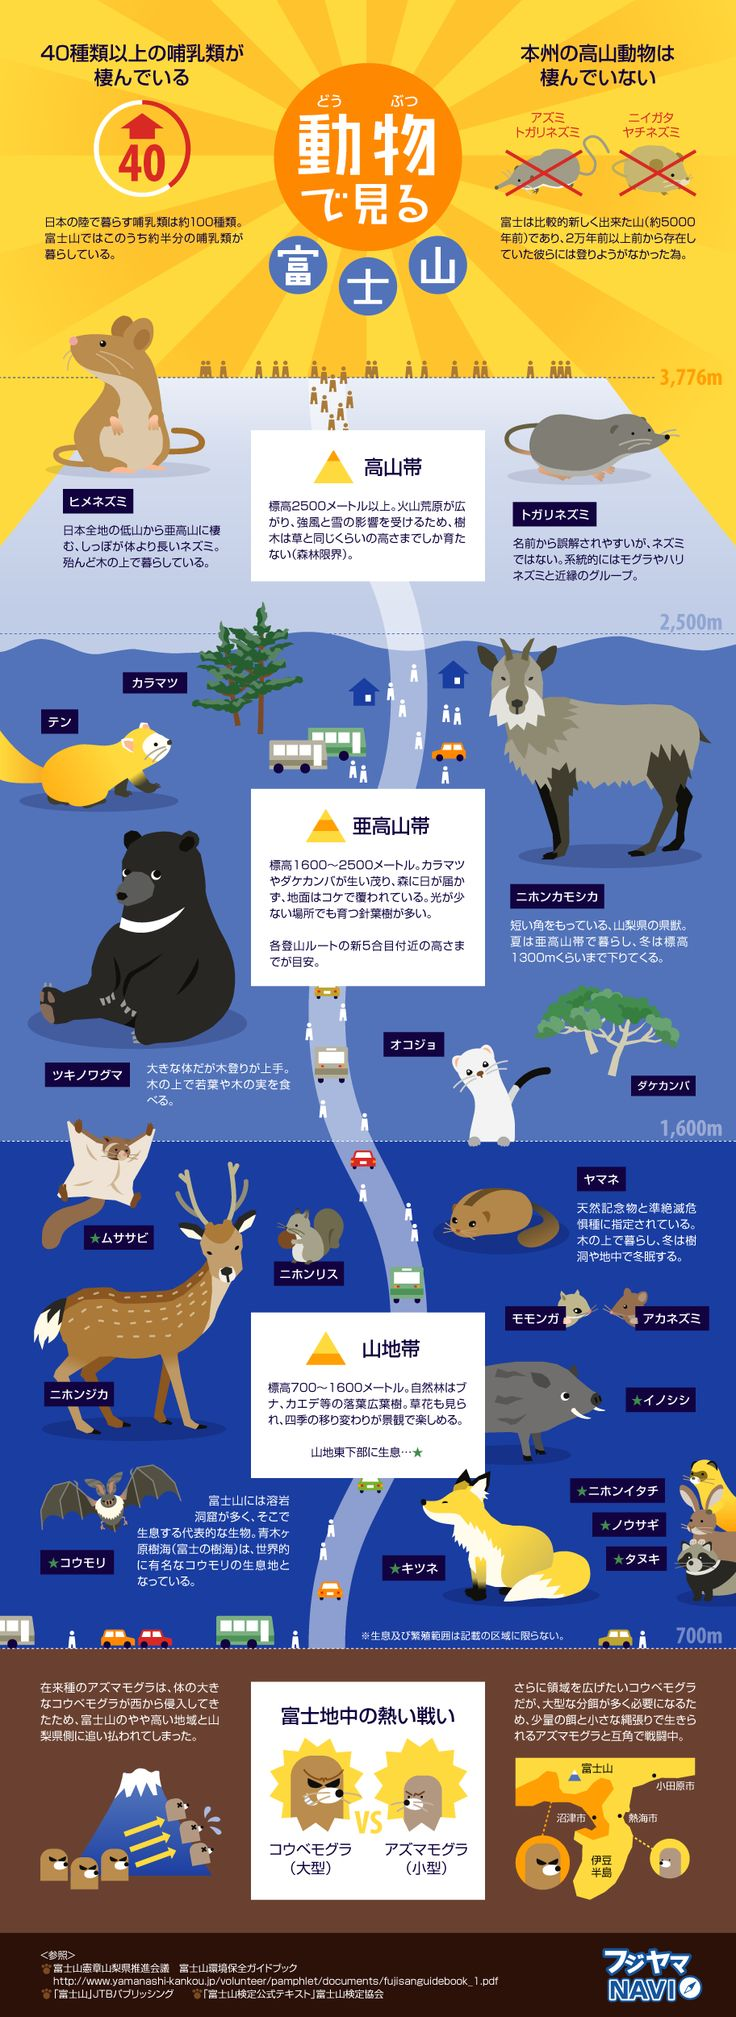 Types of Animals on Fuji Mountain